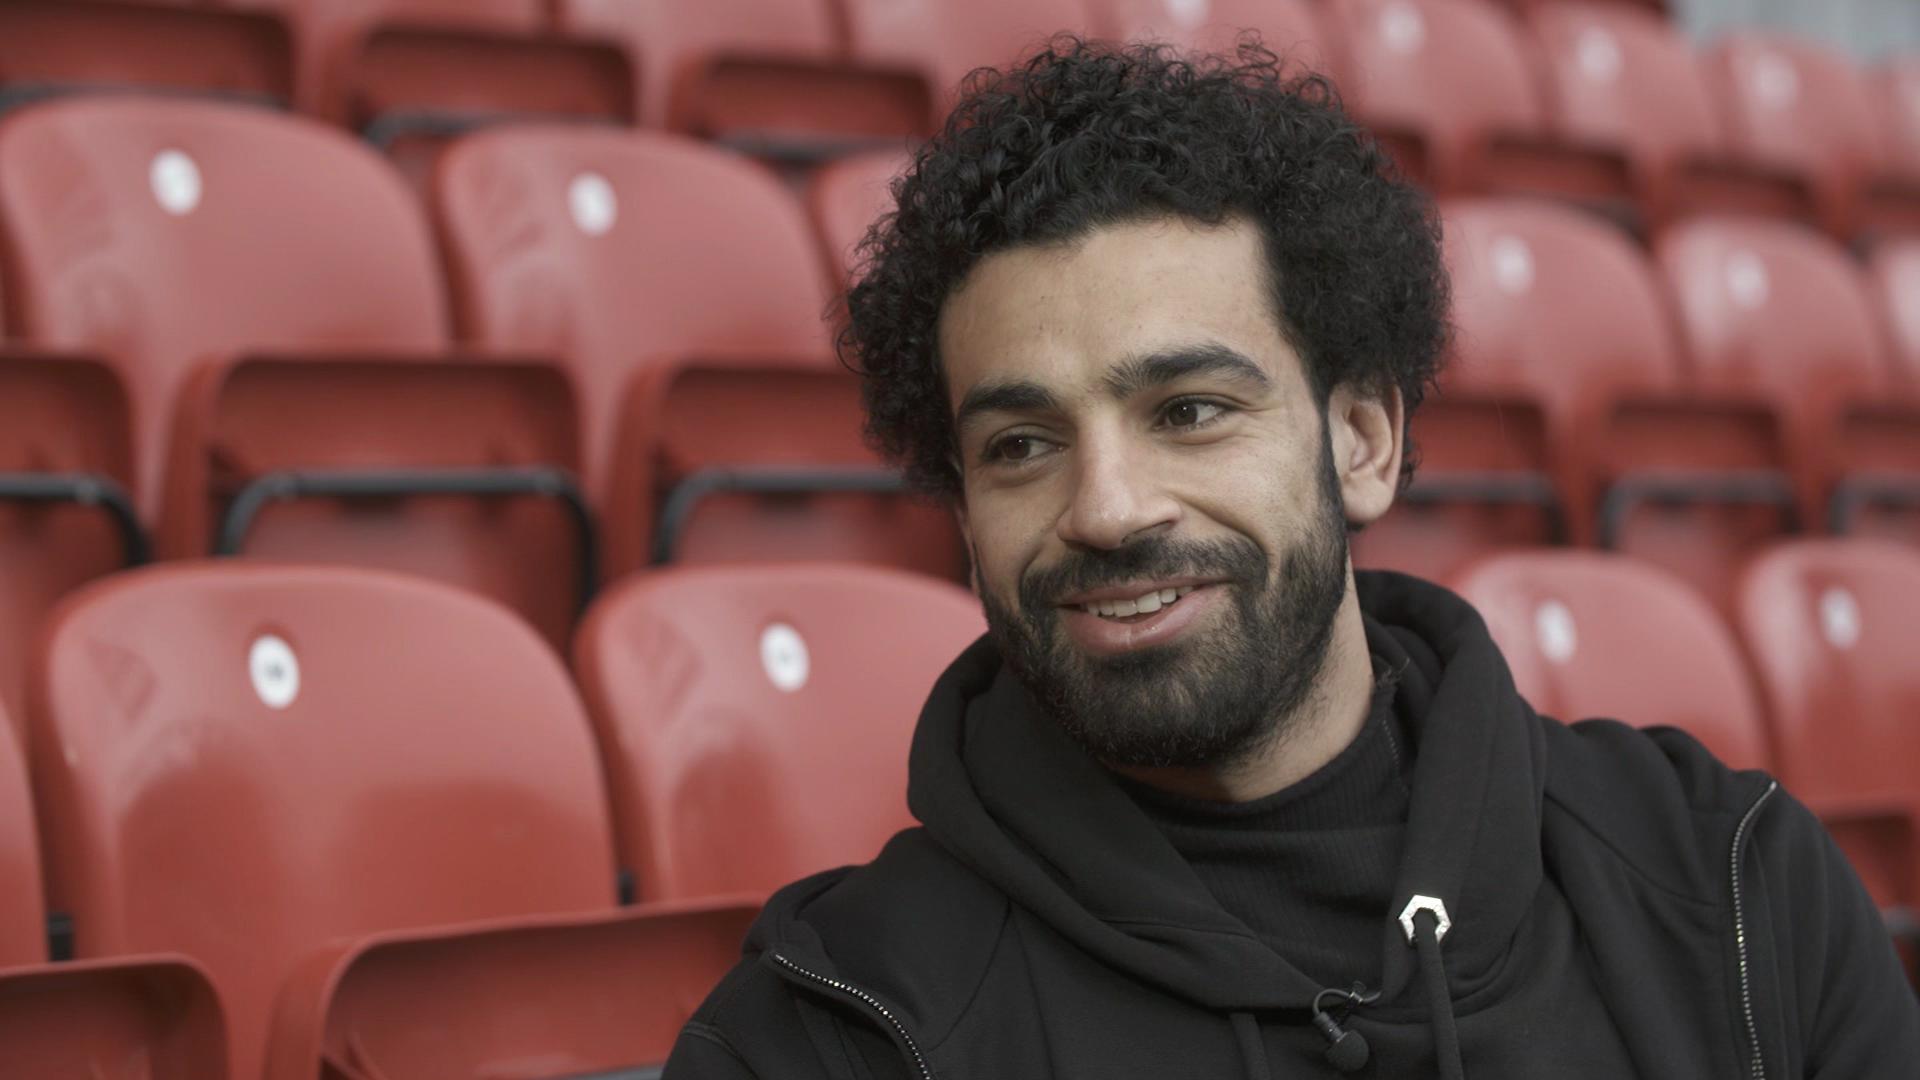 Liverpool's Mohamed Salah tells CNN that it's easier for Harry Kane or Sergio Aguero to win the Golden Boot.